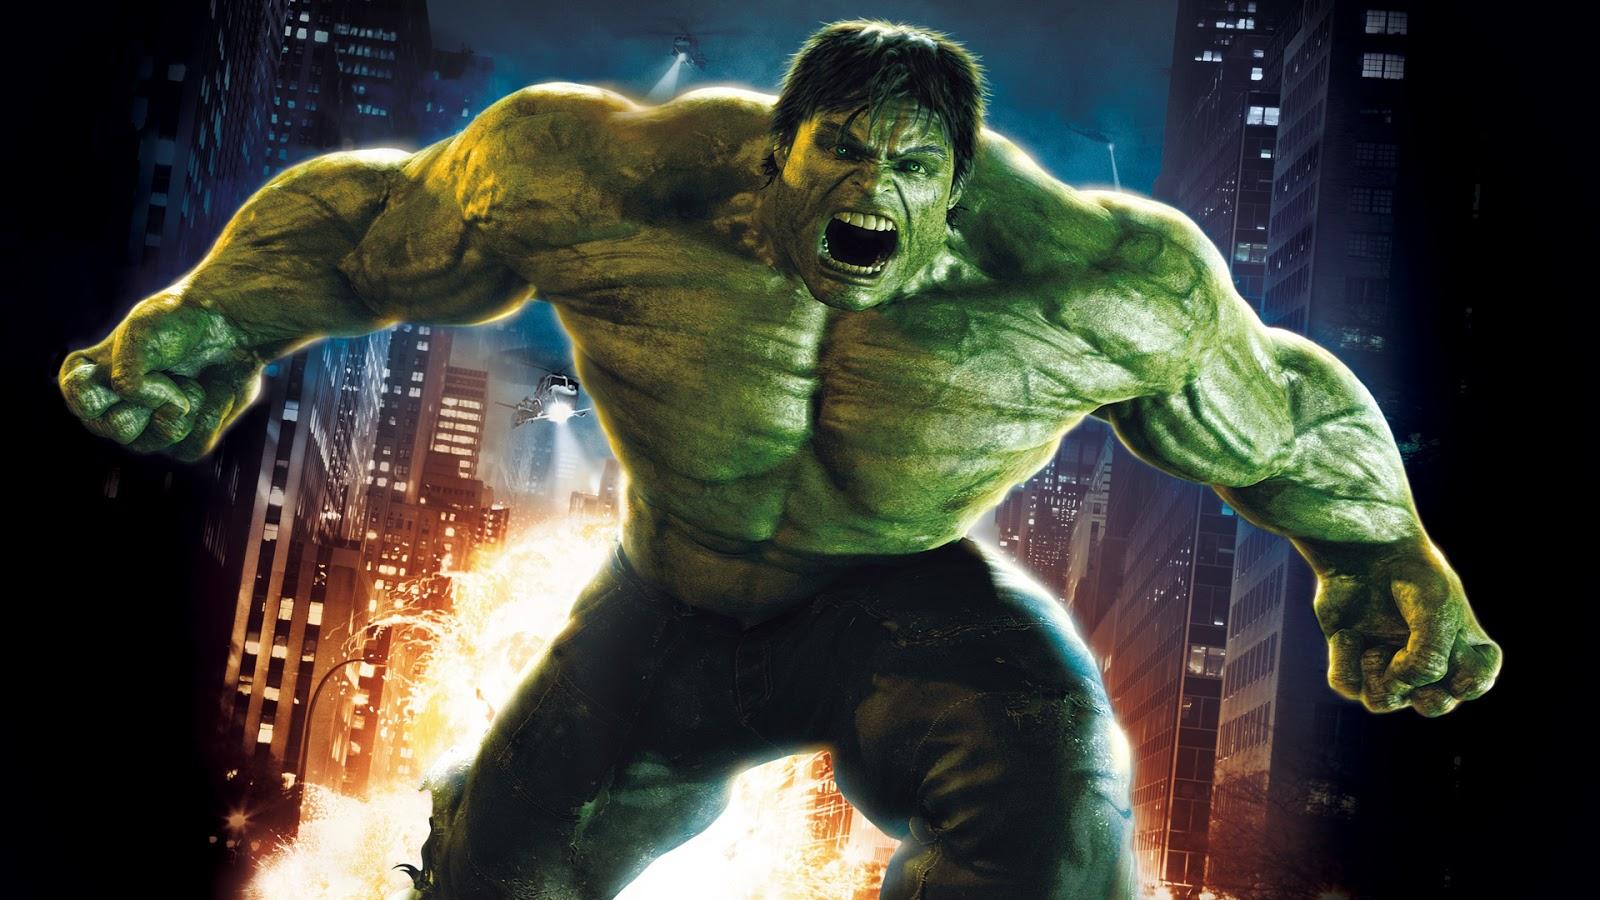 angry hulk throwing rocks - photo #18